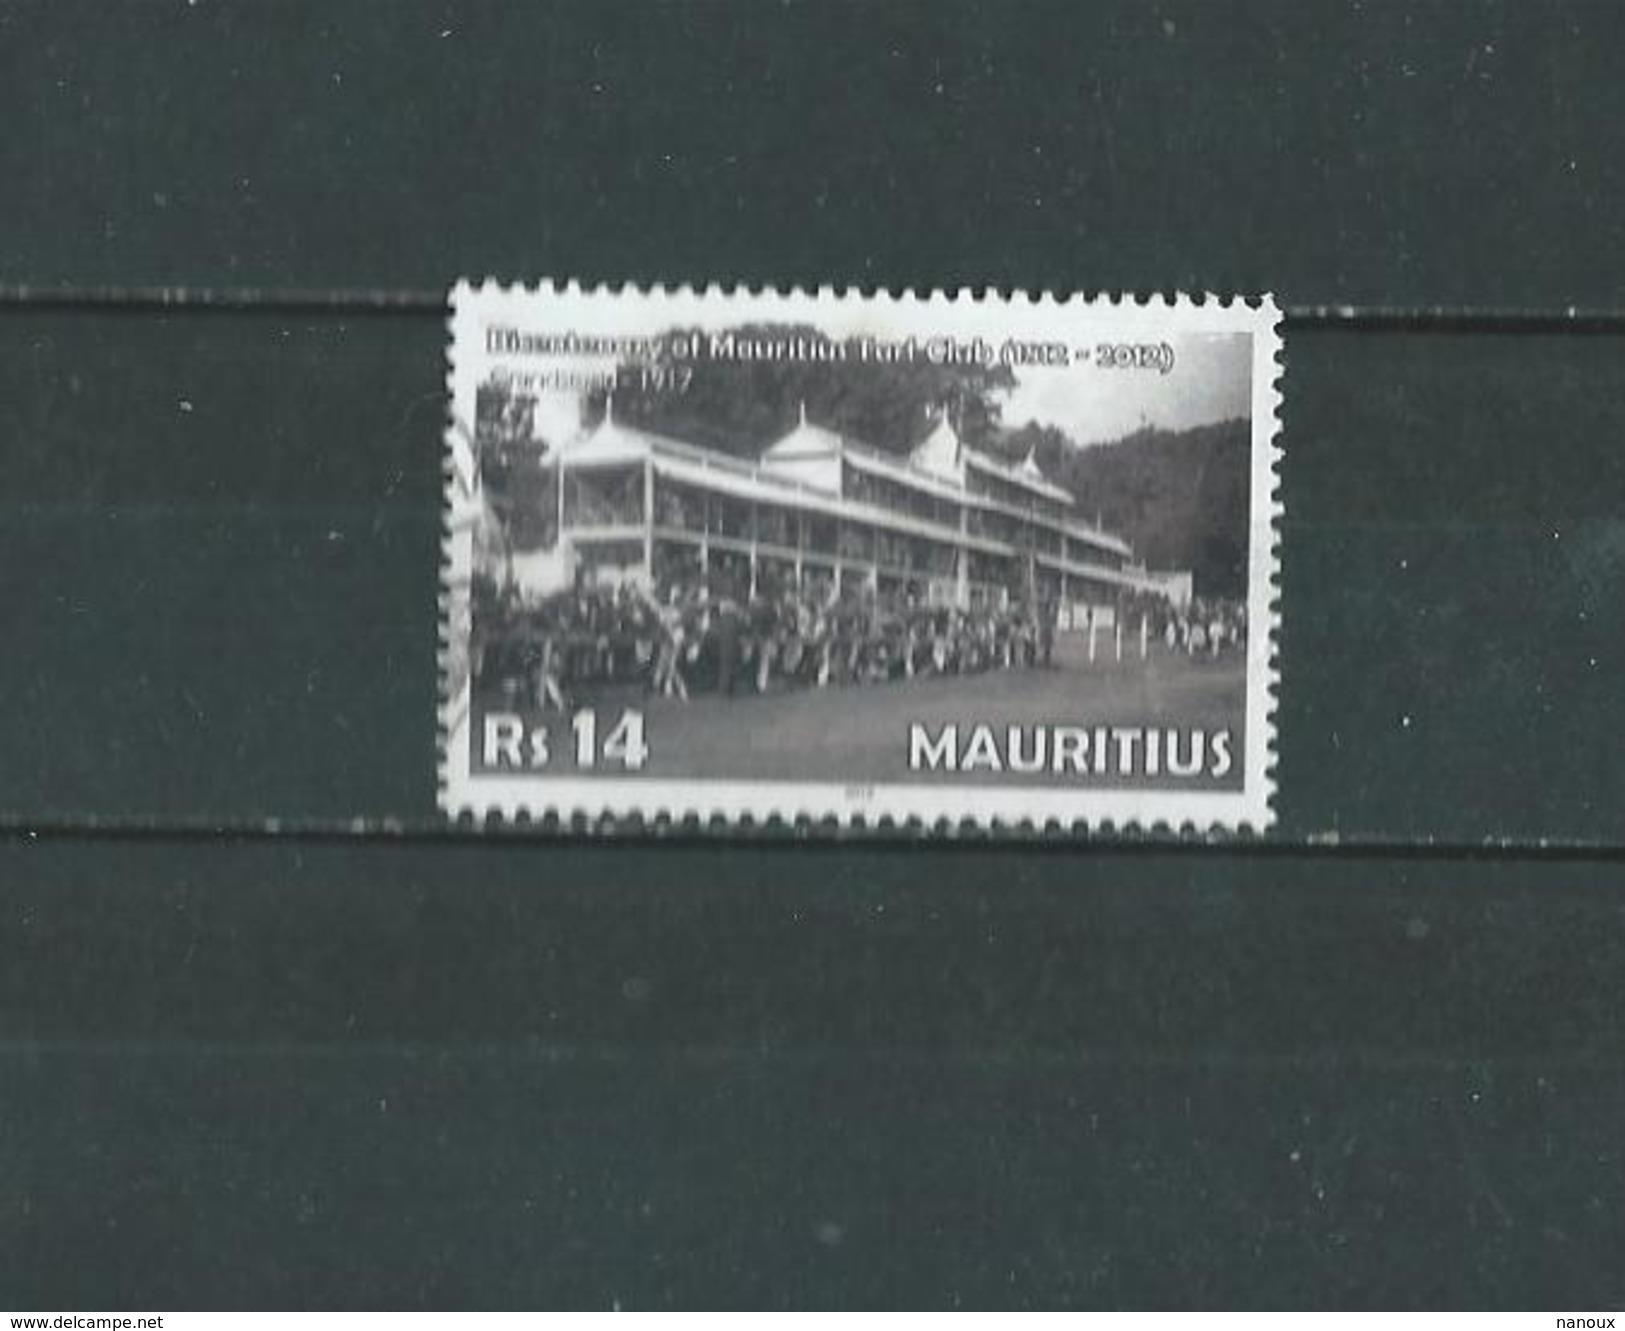 Timbre Oblitére De Ile Maurice 2012 - Maurice (1968-...)